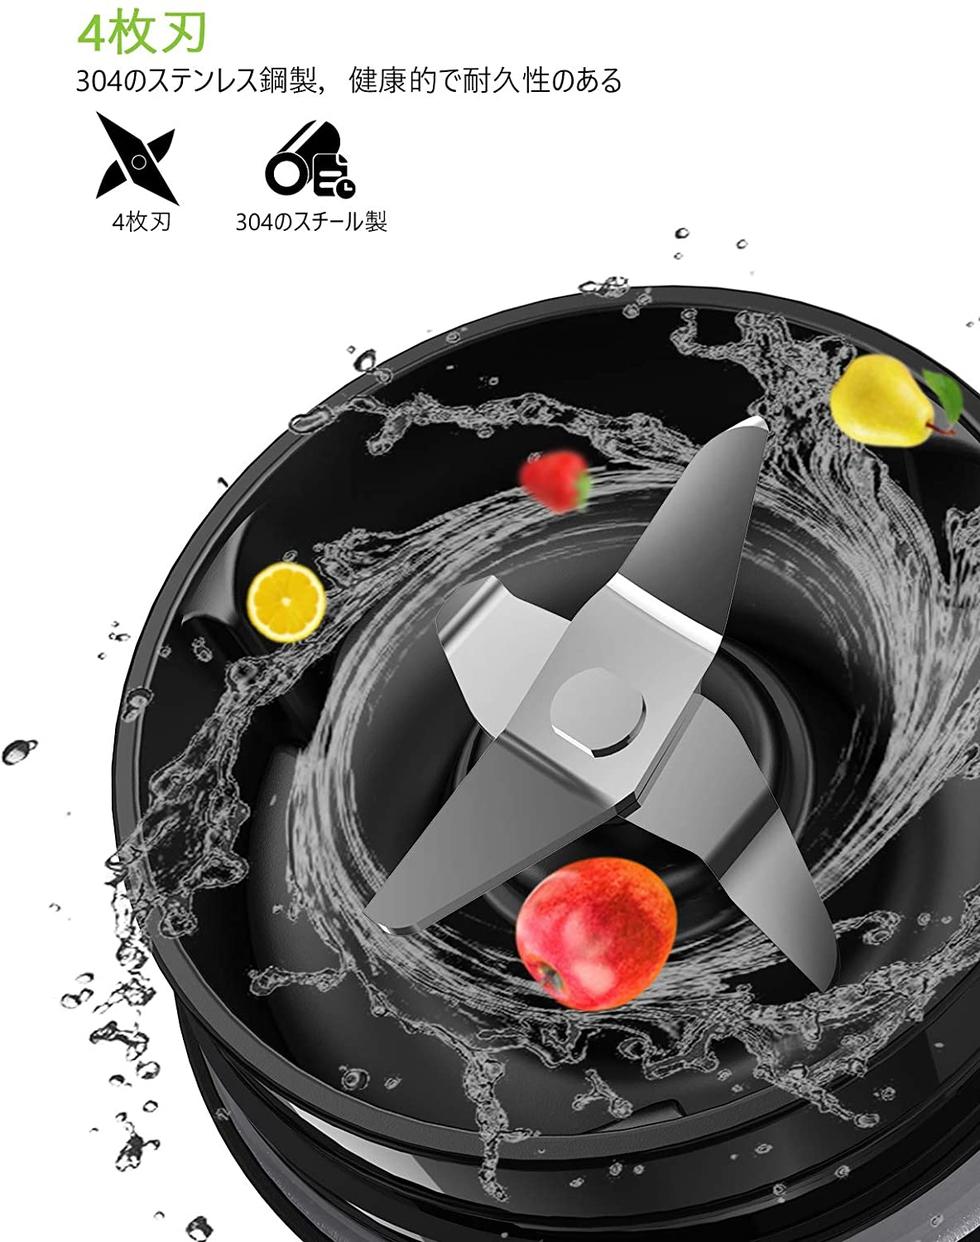 homgeek(ホームギーク) ミキサー小型の商品画像4